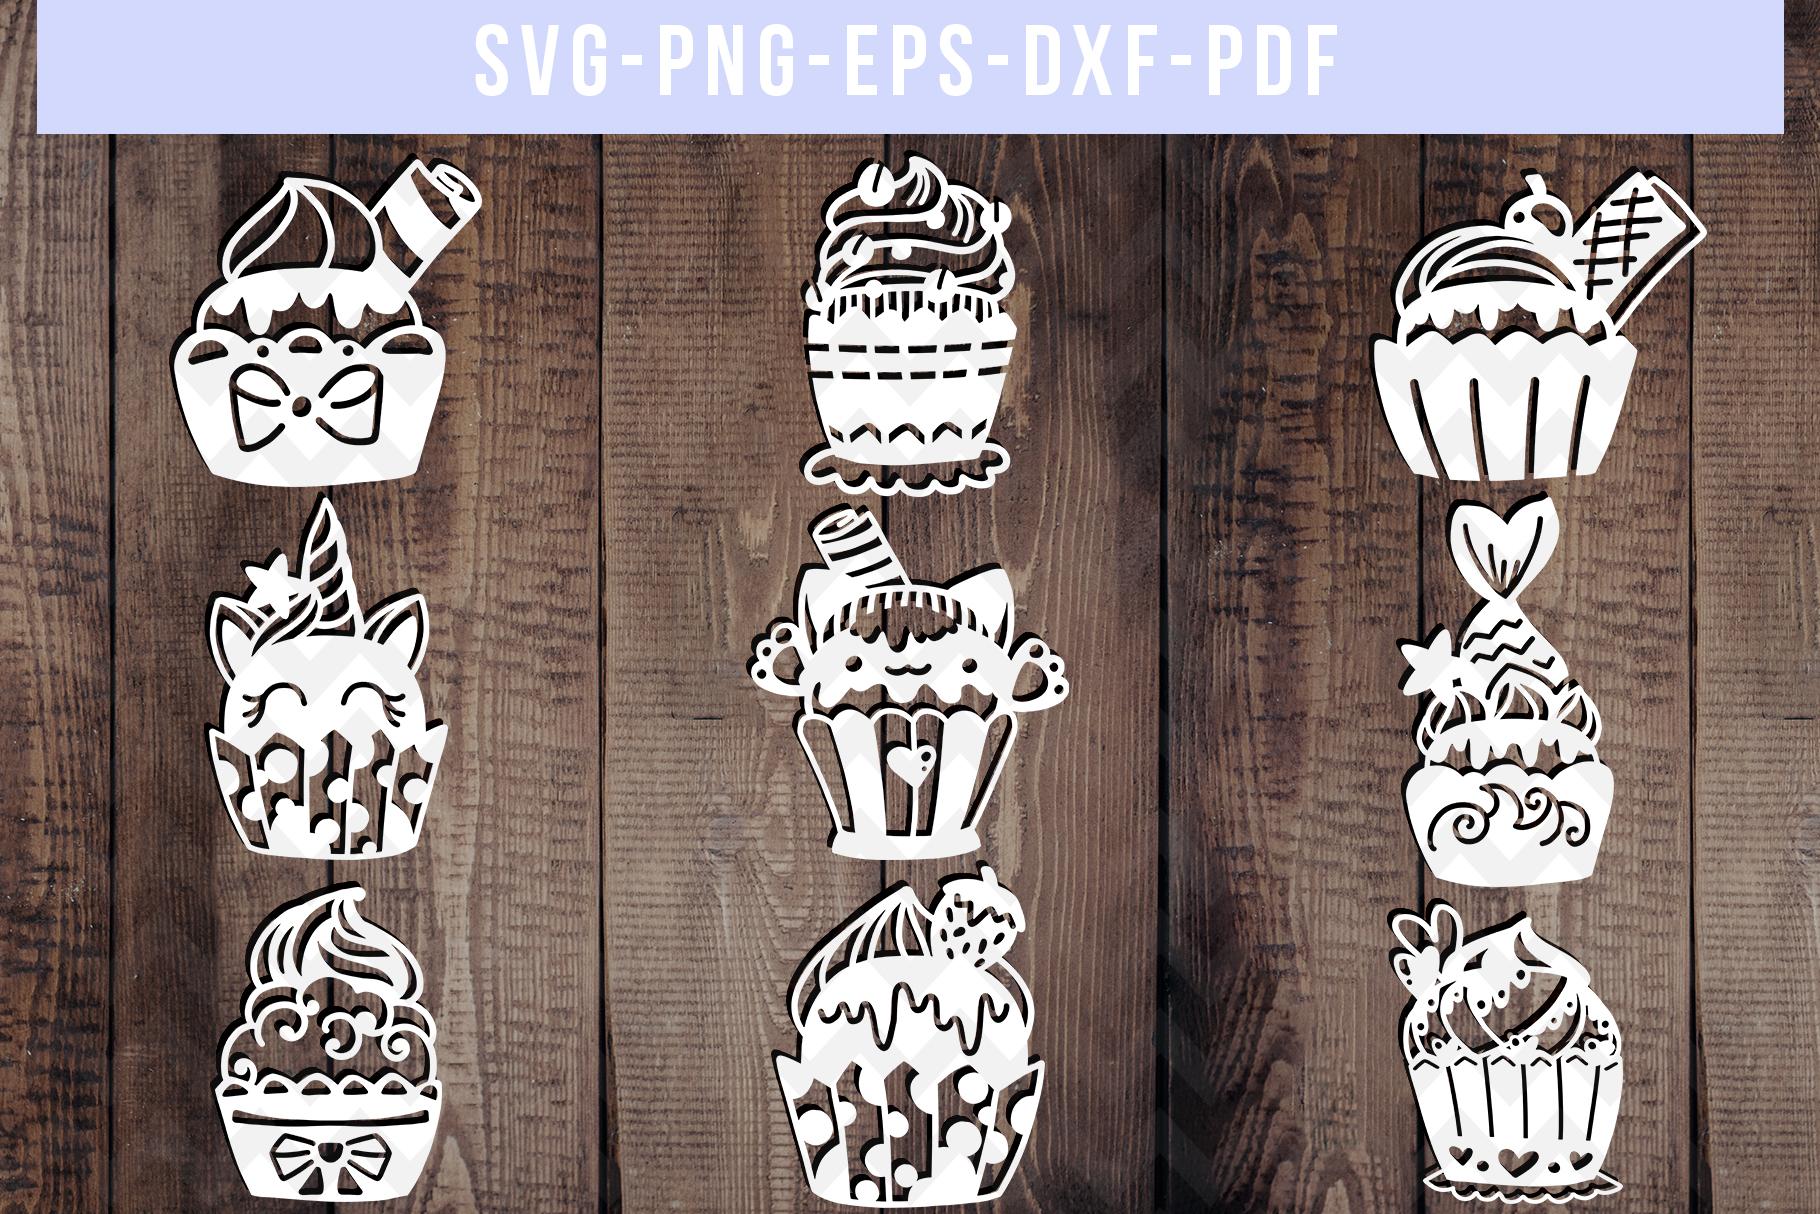 Bundle Of 9 Cupcake Papercut Templates, SVG Cutting File PDF example image 1